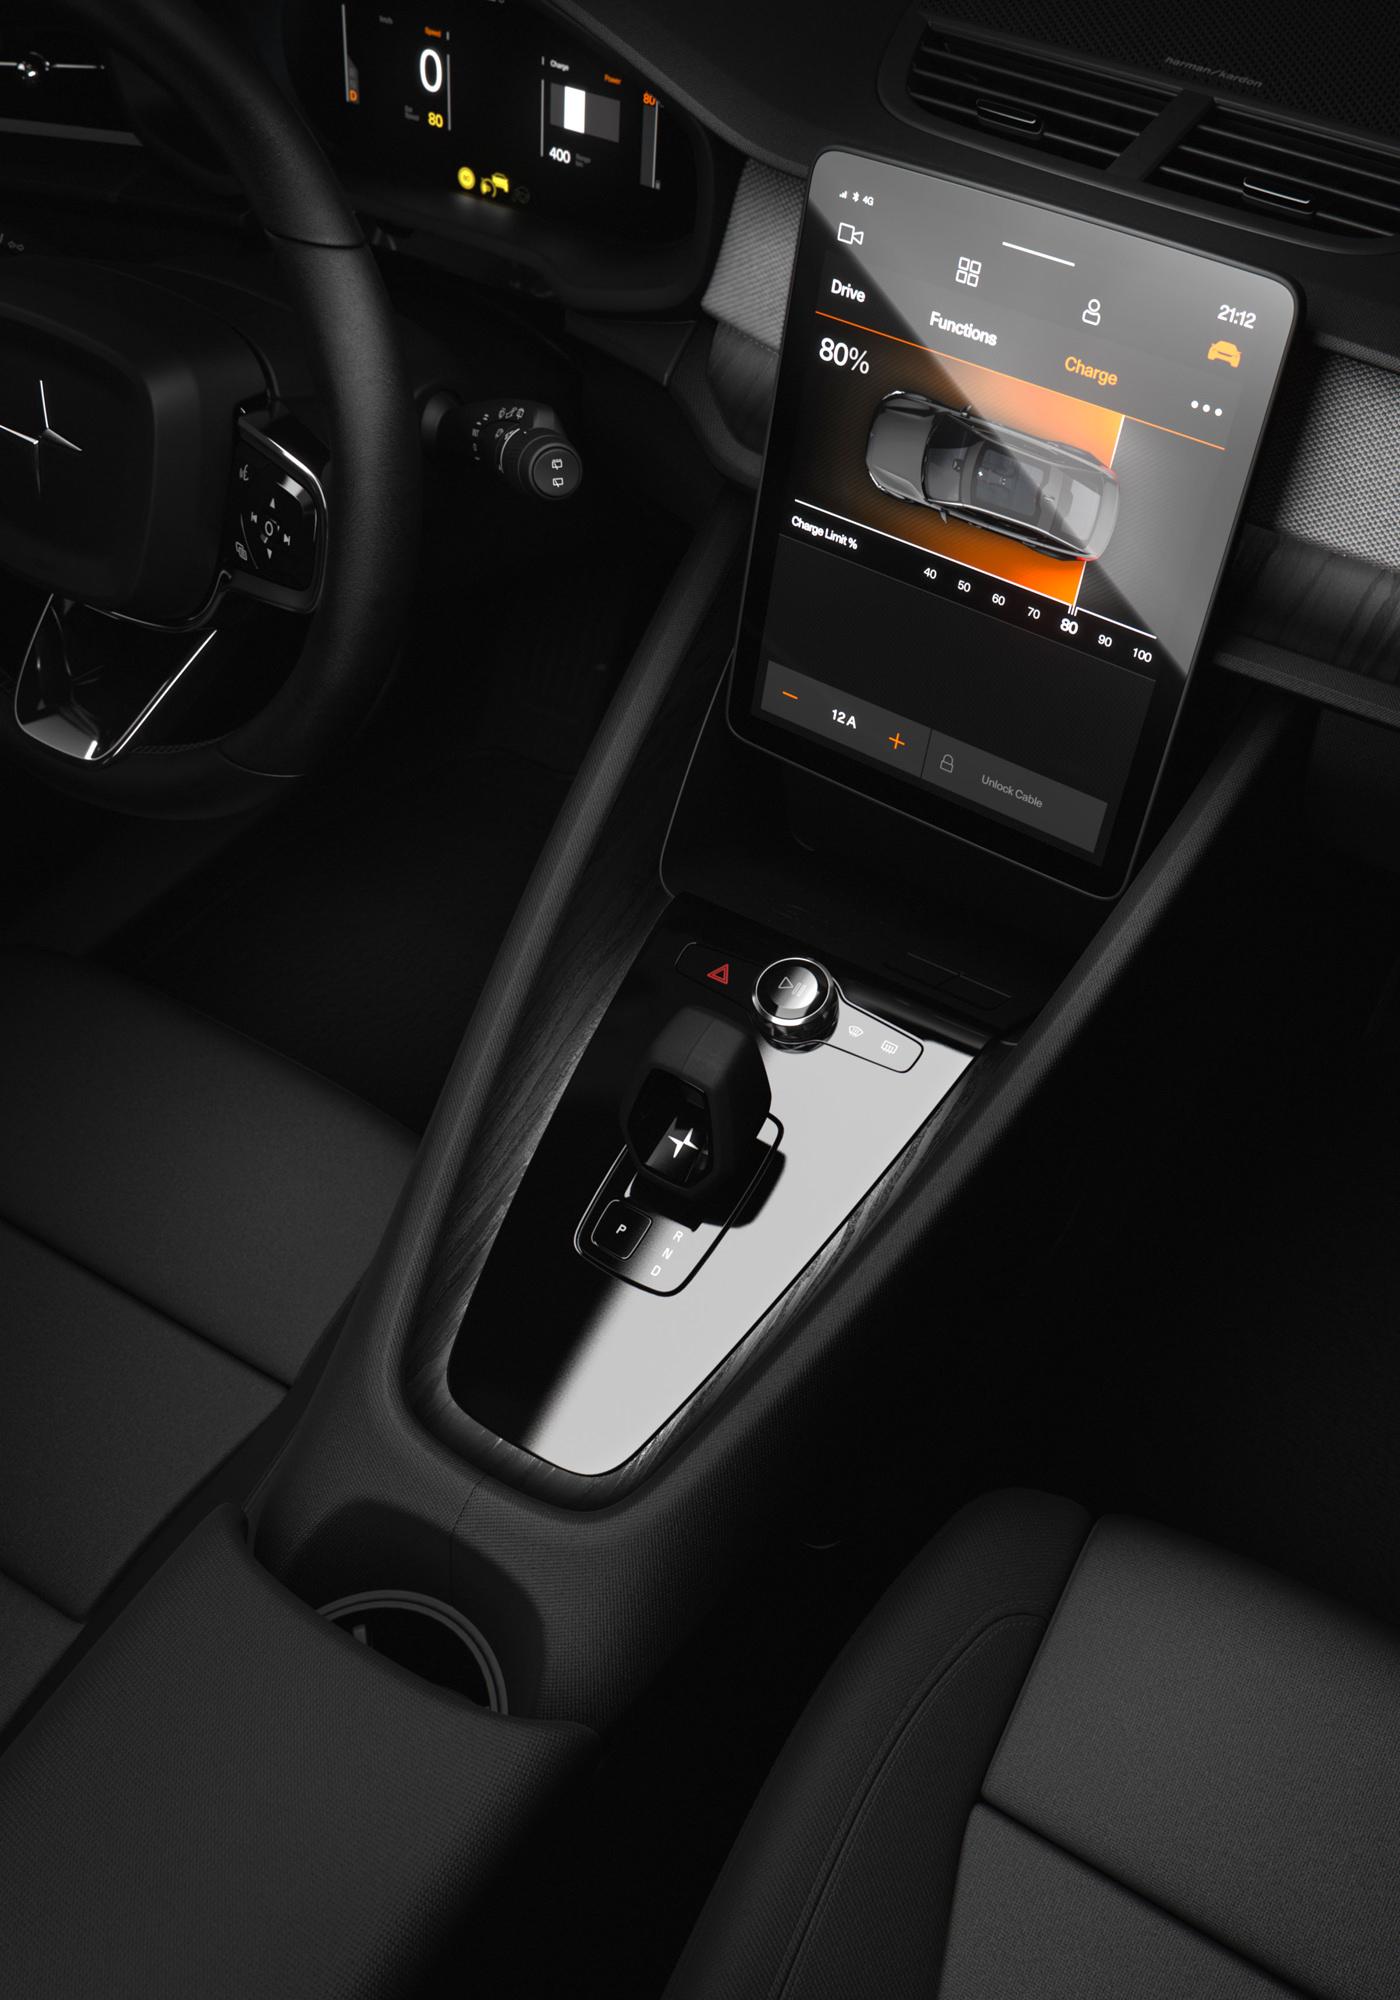 The Polestar 2 Electric Car Intérieur